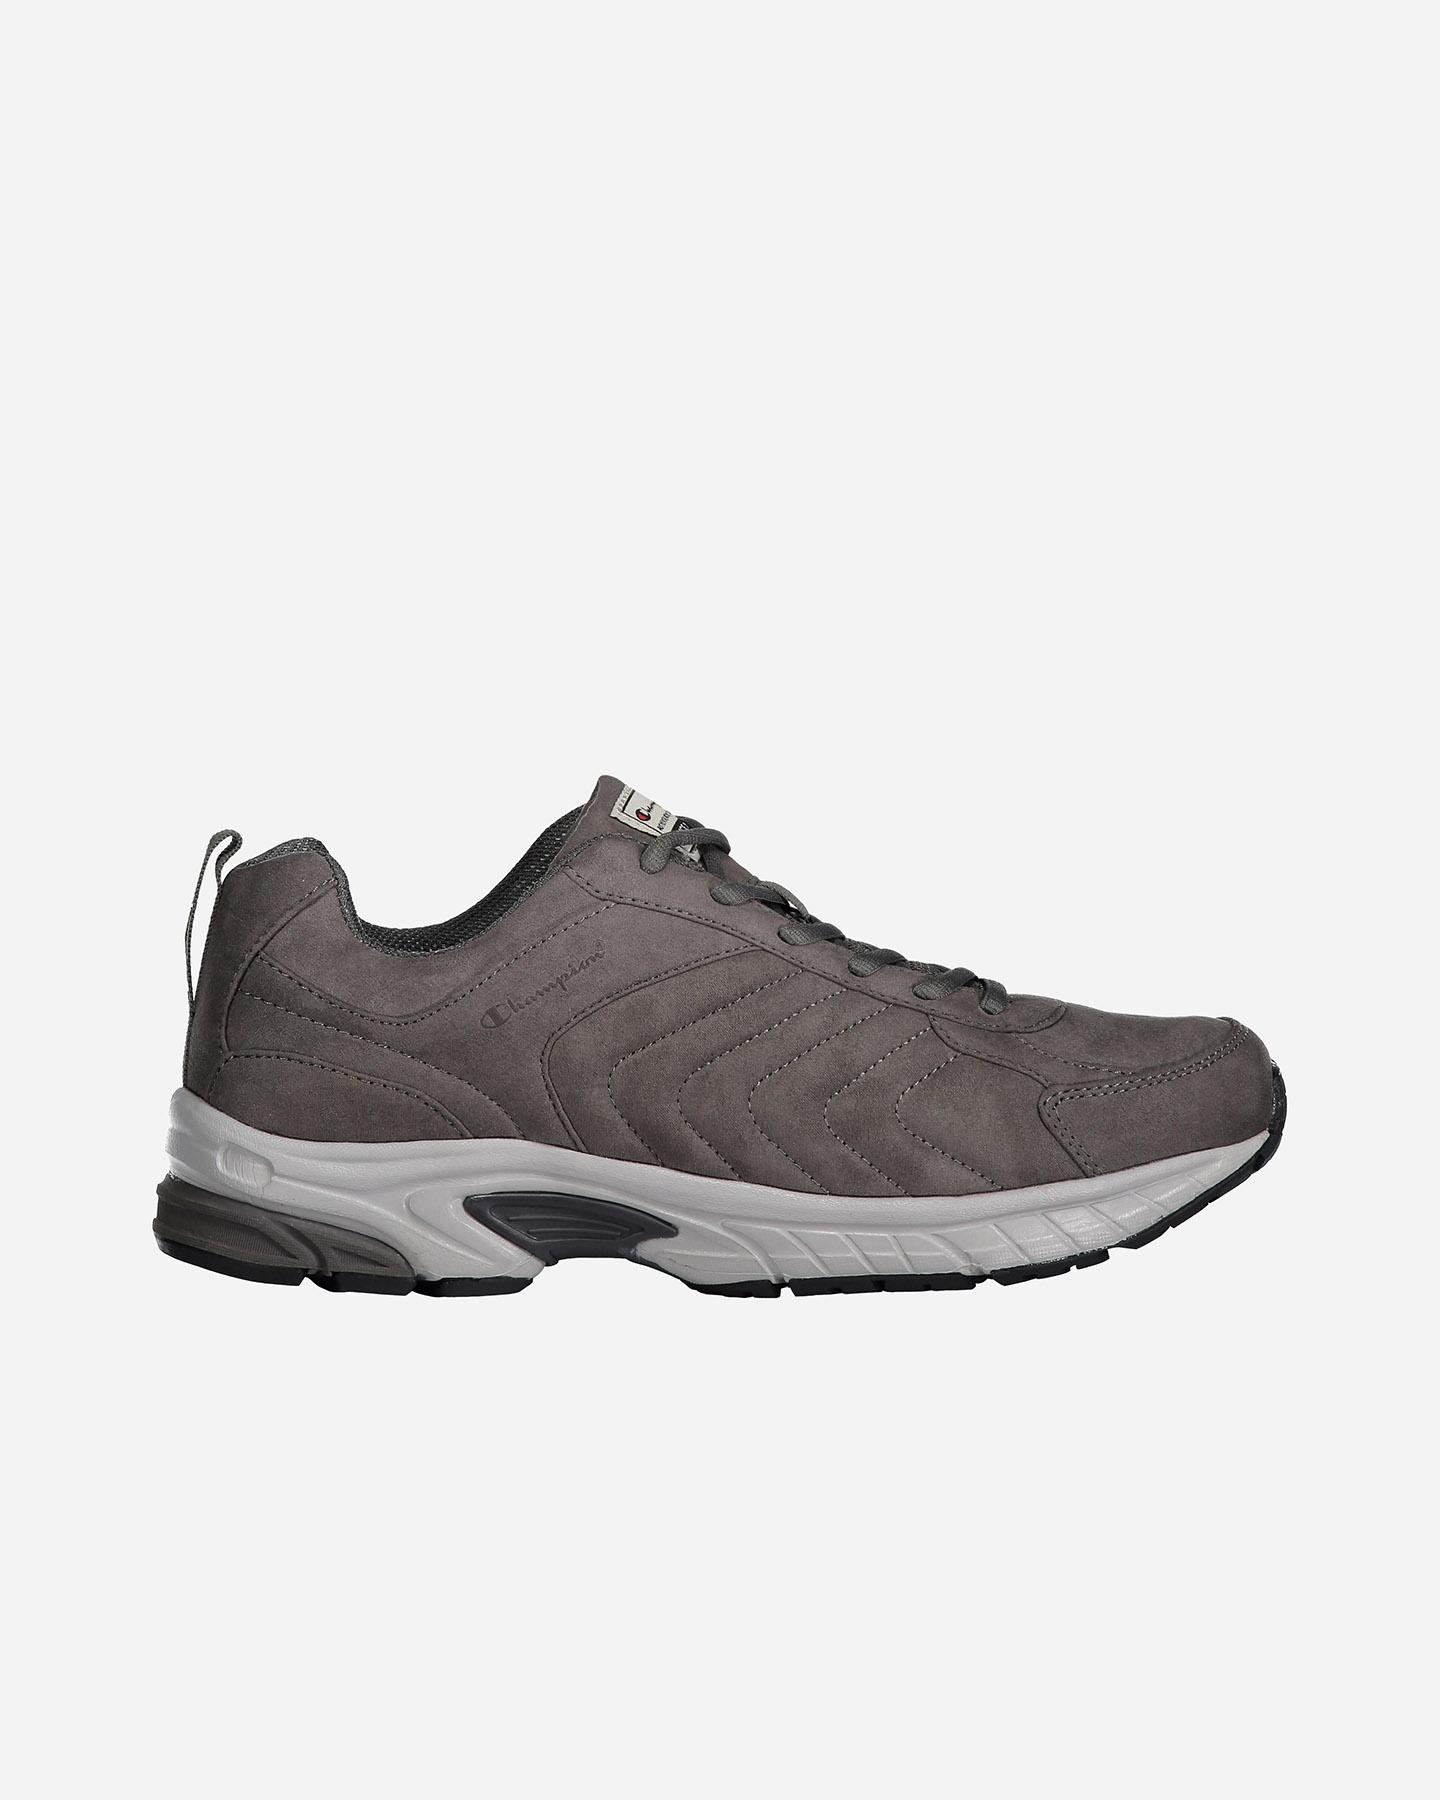 0c14fa1786910 Scarpe sneakers CHAMPION X-TRAINING MI-FI M